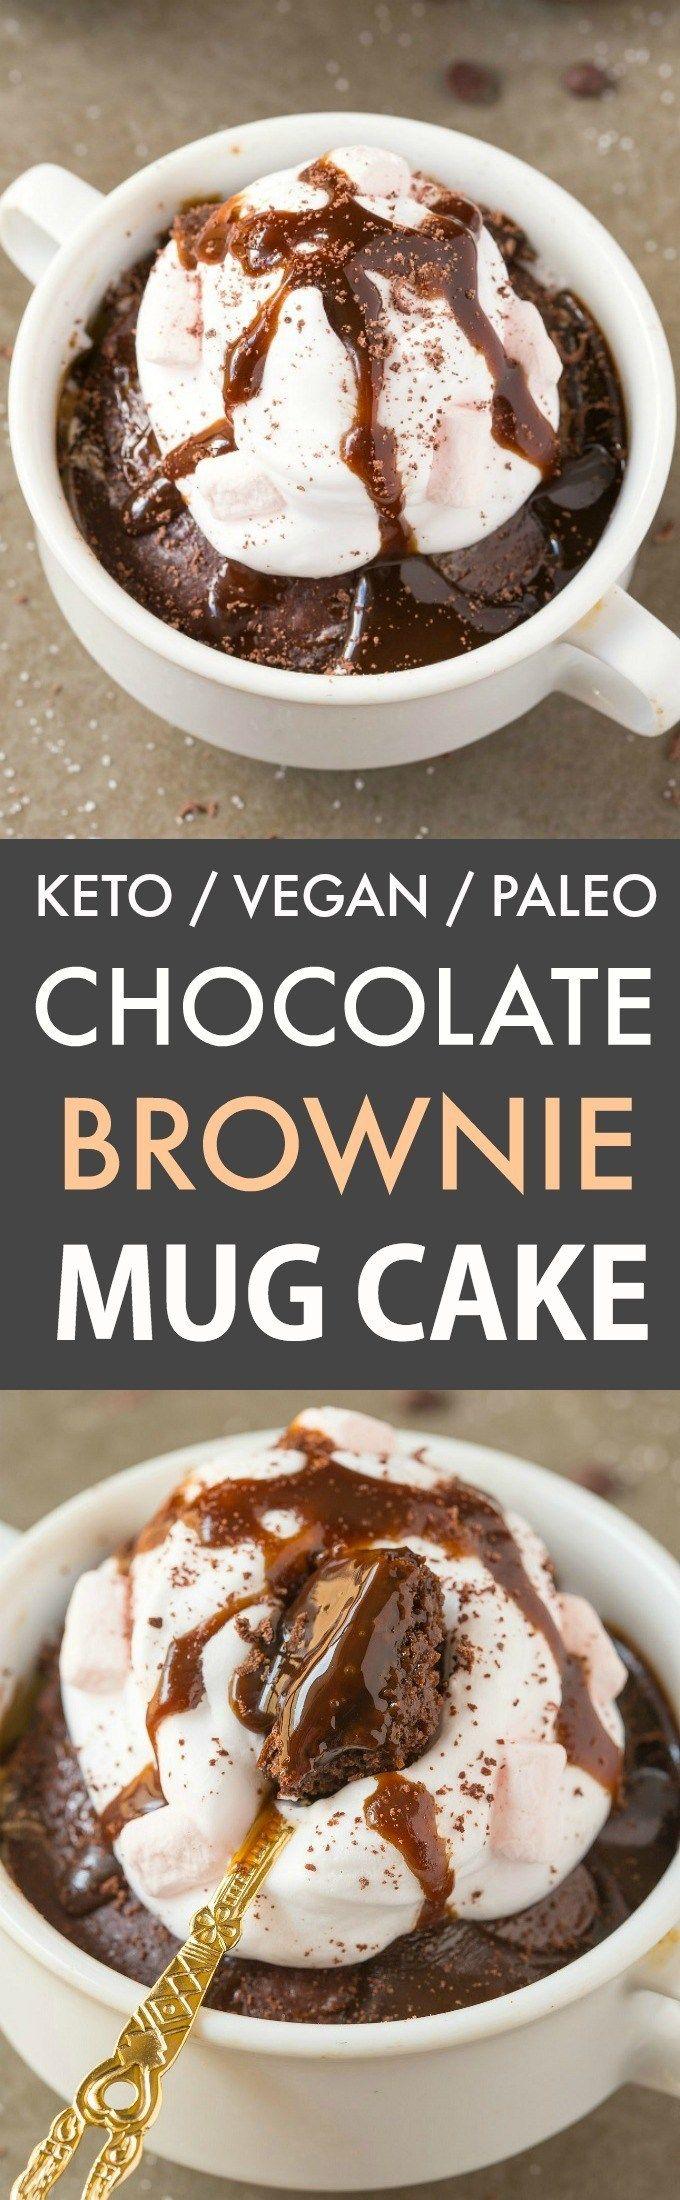 This keto chocolate brownie mug cake is the BEST vegan and ...